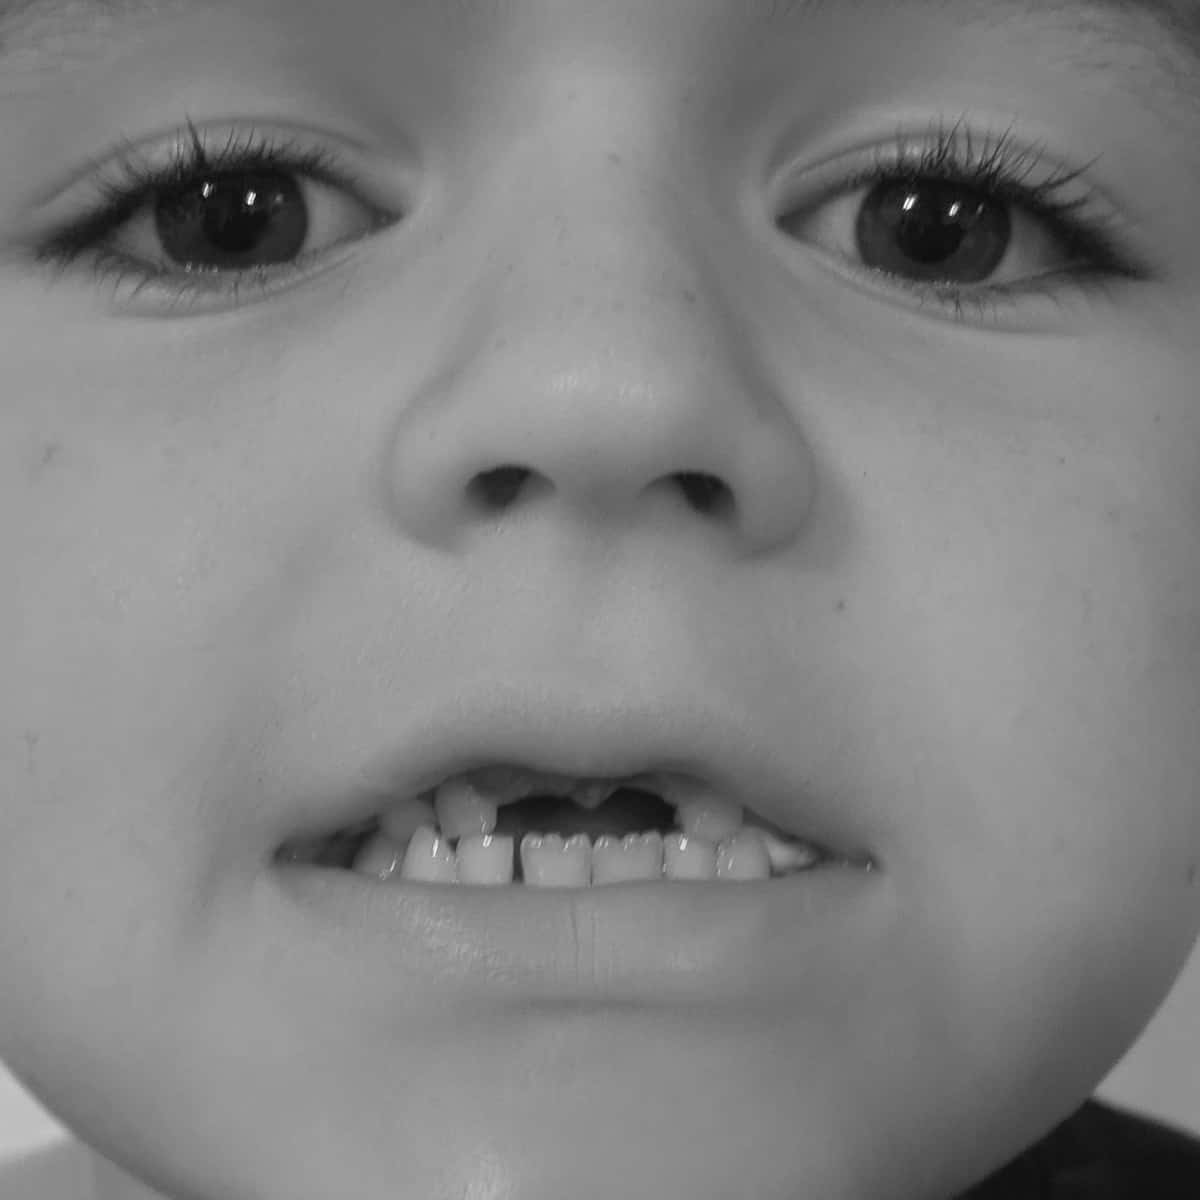 Boy missing front teeth